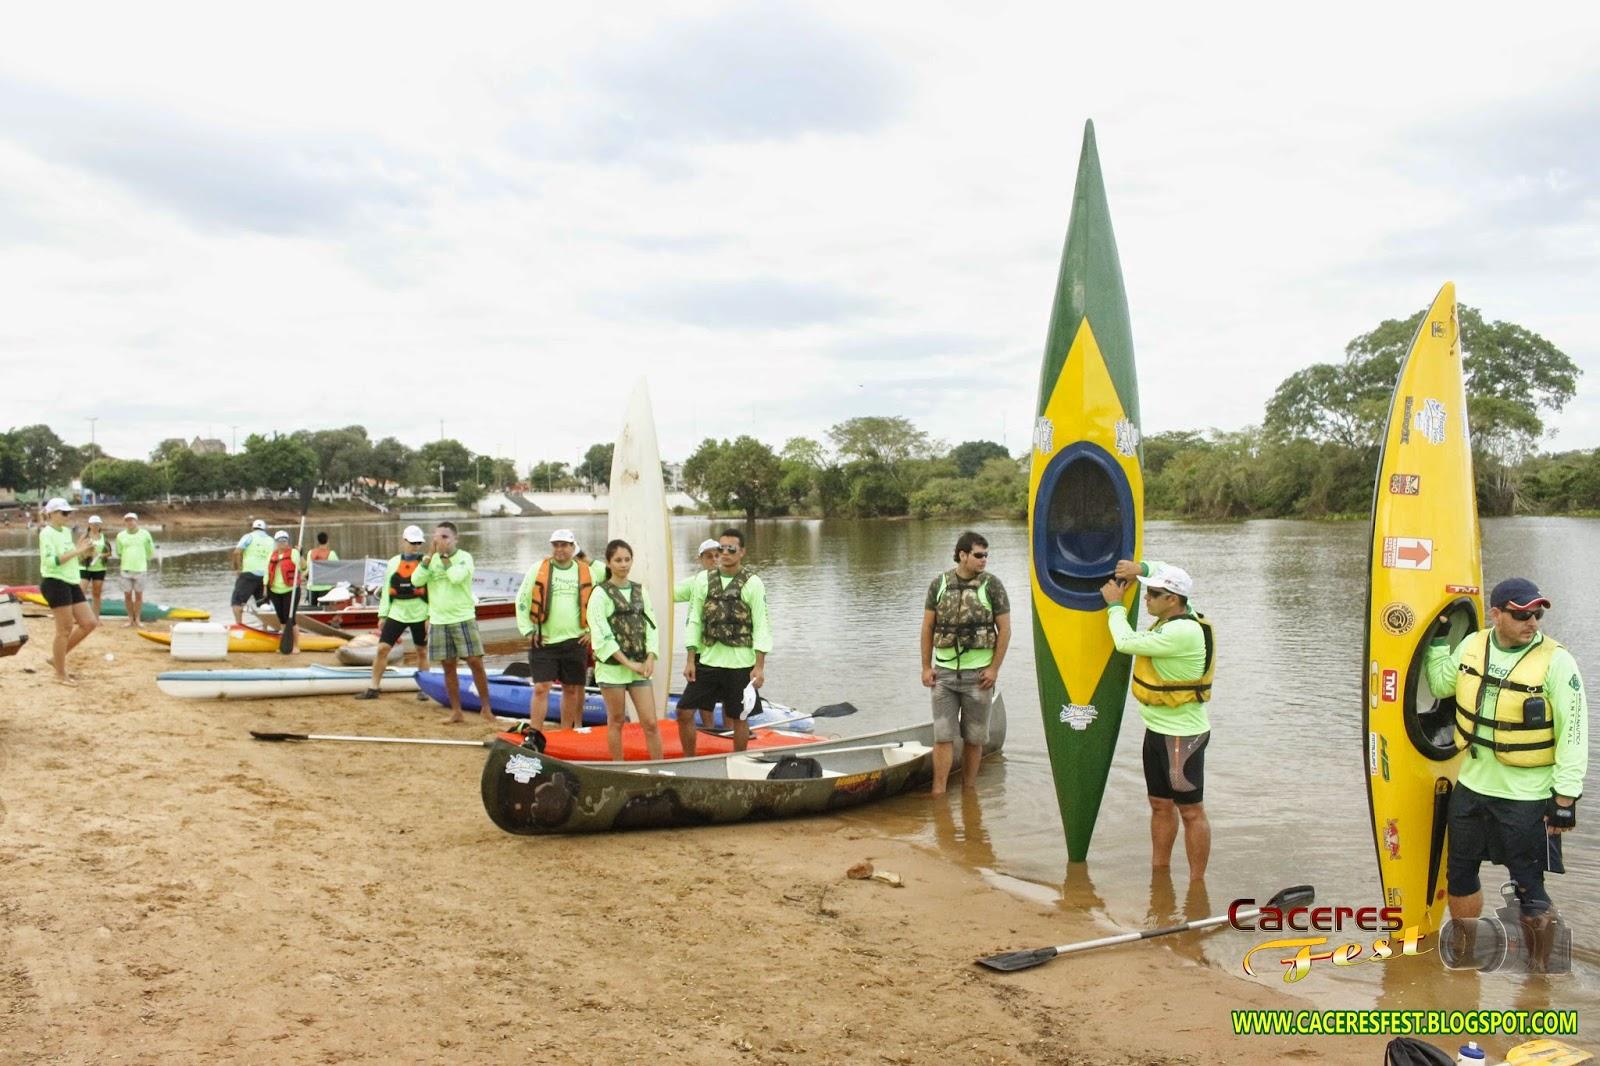 http://caceresfest.blogspot.com.br/2014/06/1-regata-verde-do-pantanal-caceres-mt.html